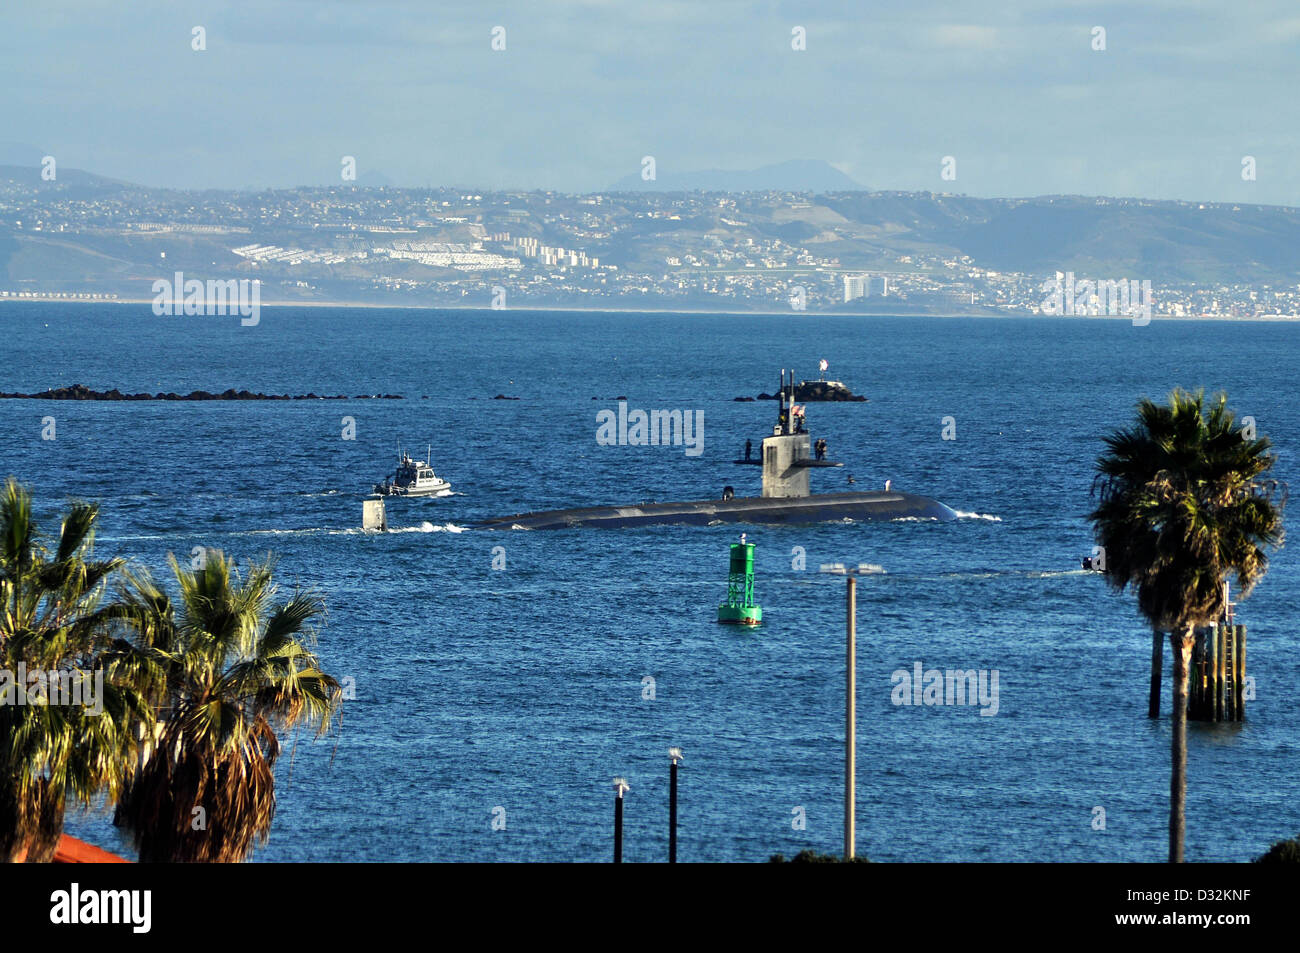 The attack submarine USS Albuquerque (SSN 706) - Stock Image